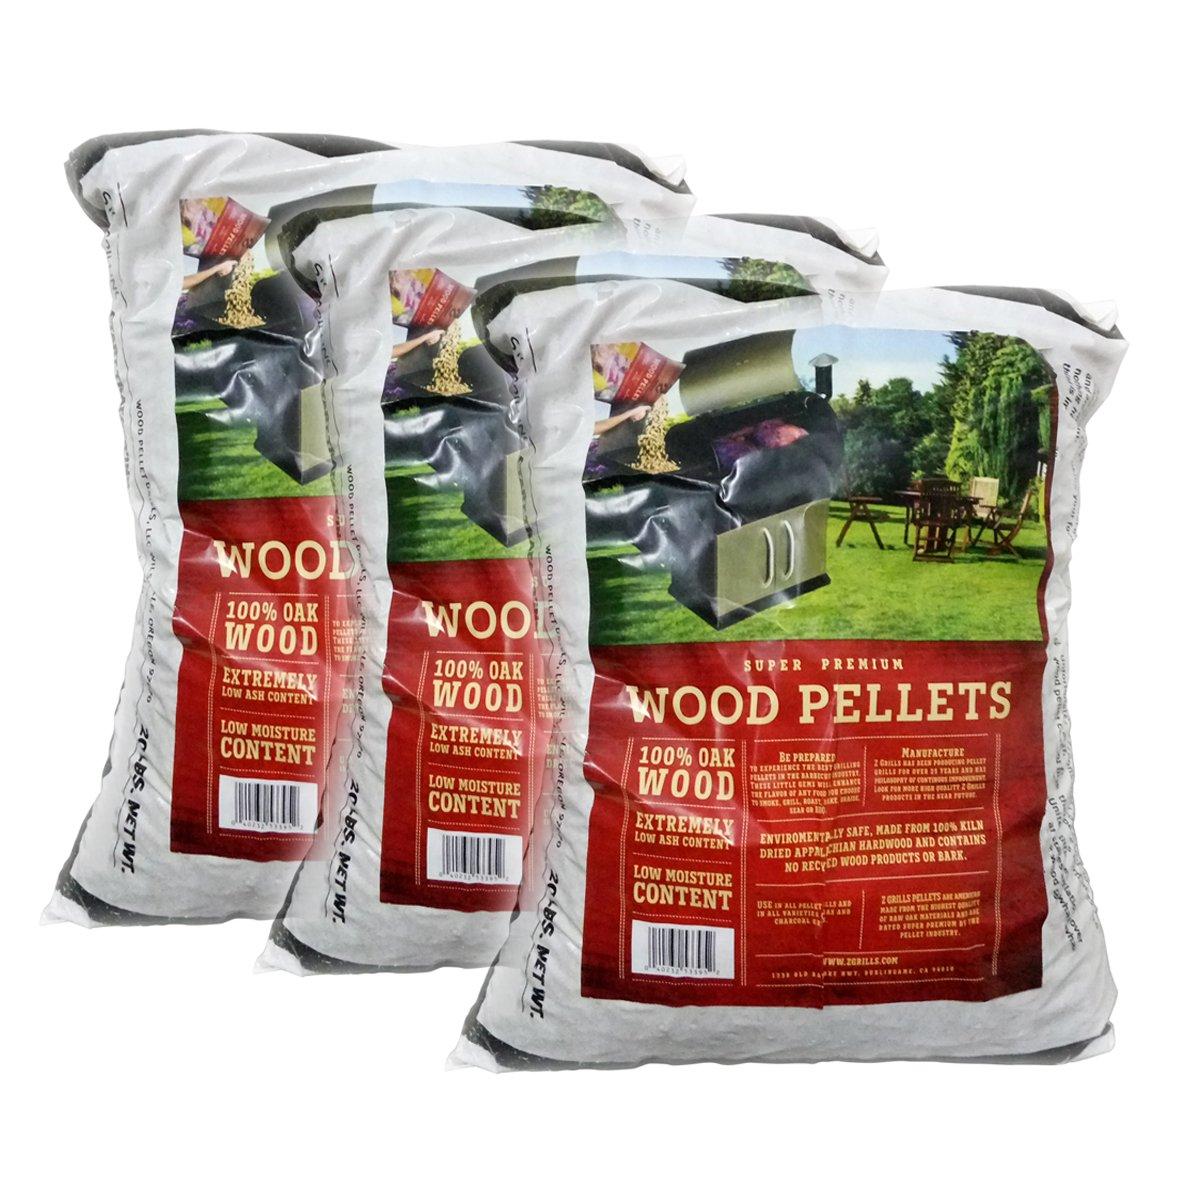 Z GRILLS Premium BBQ Wood Pellets Grilling Smoking Cooking Oak Hardwood  Pellets,20LB Per Bag Made in USA (3)